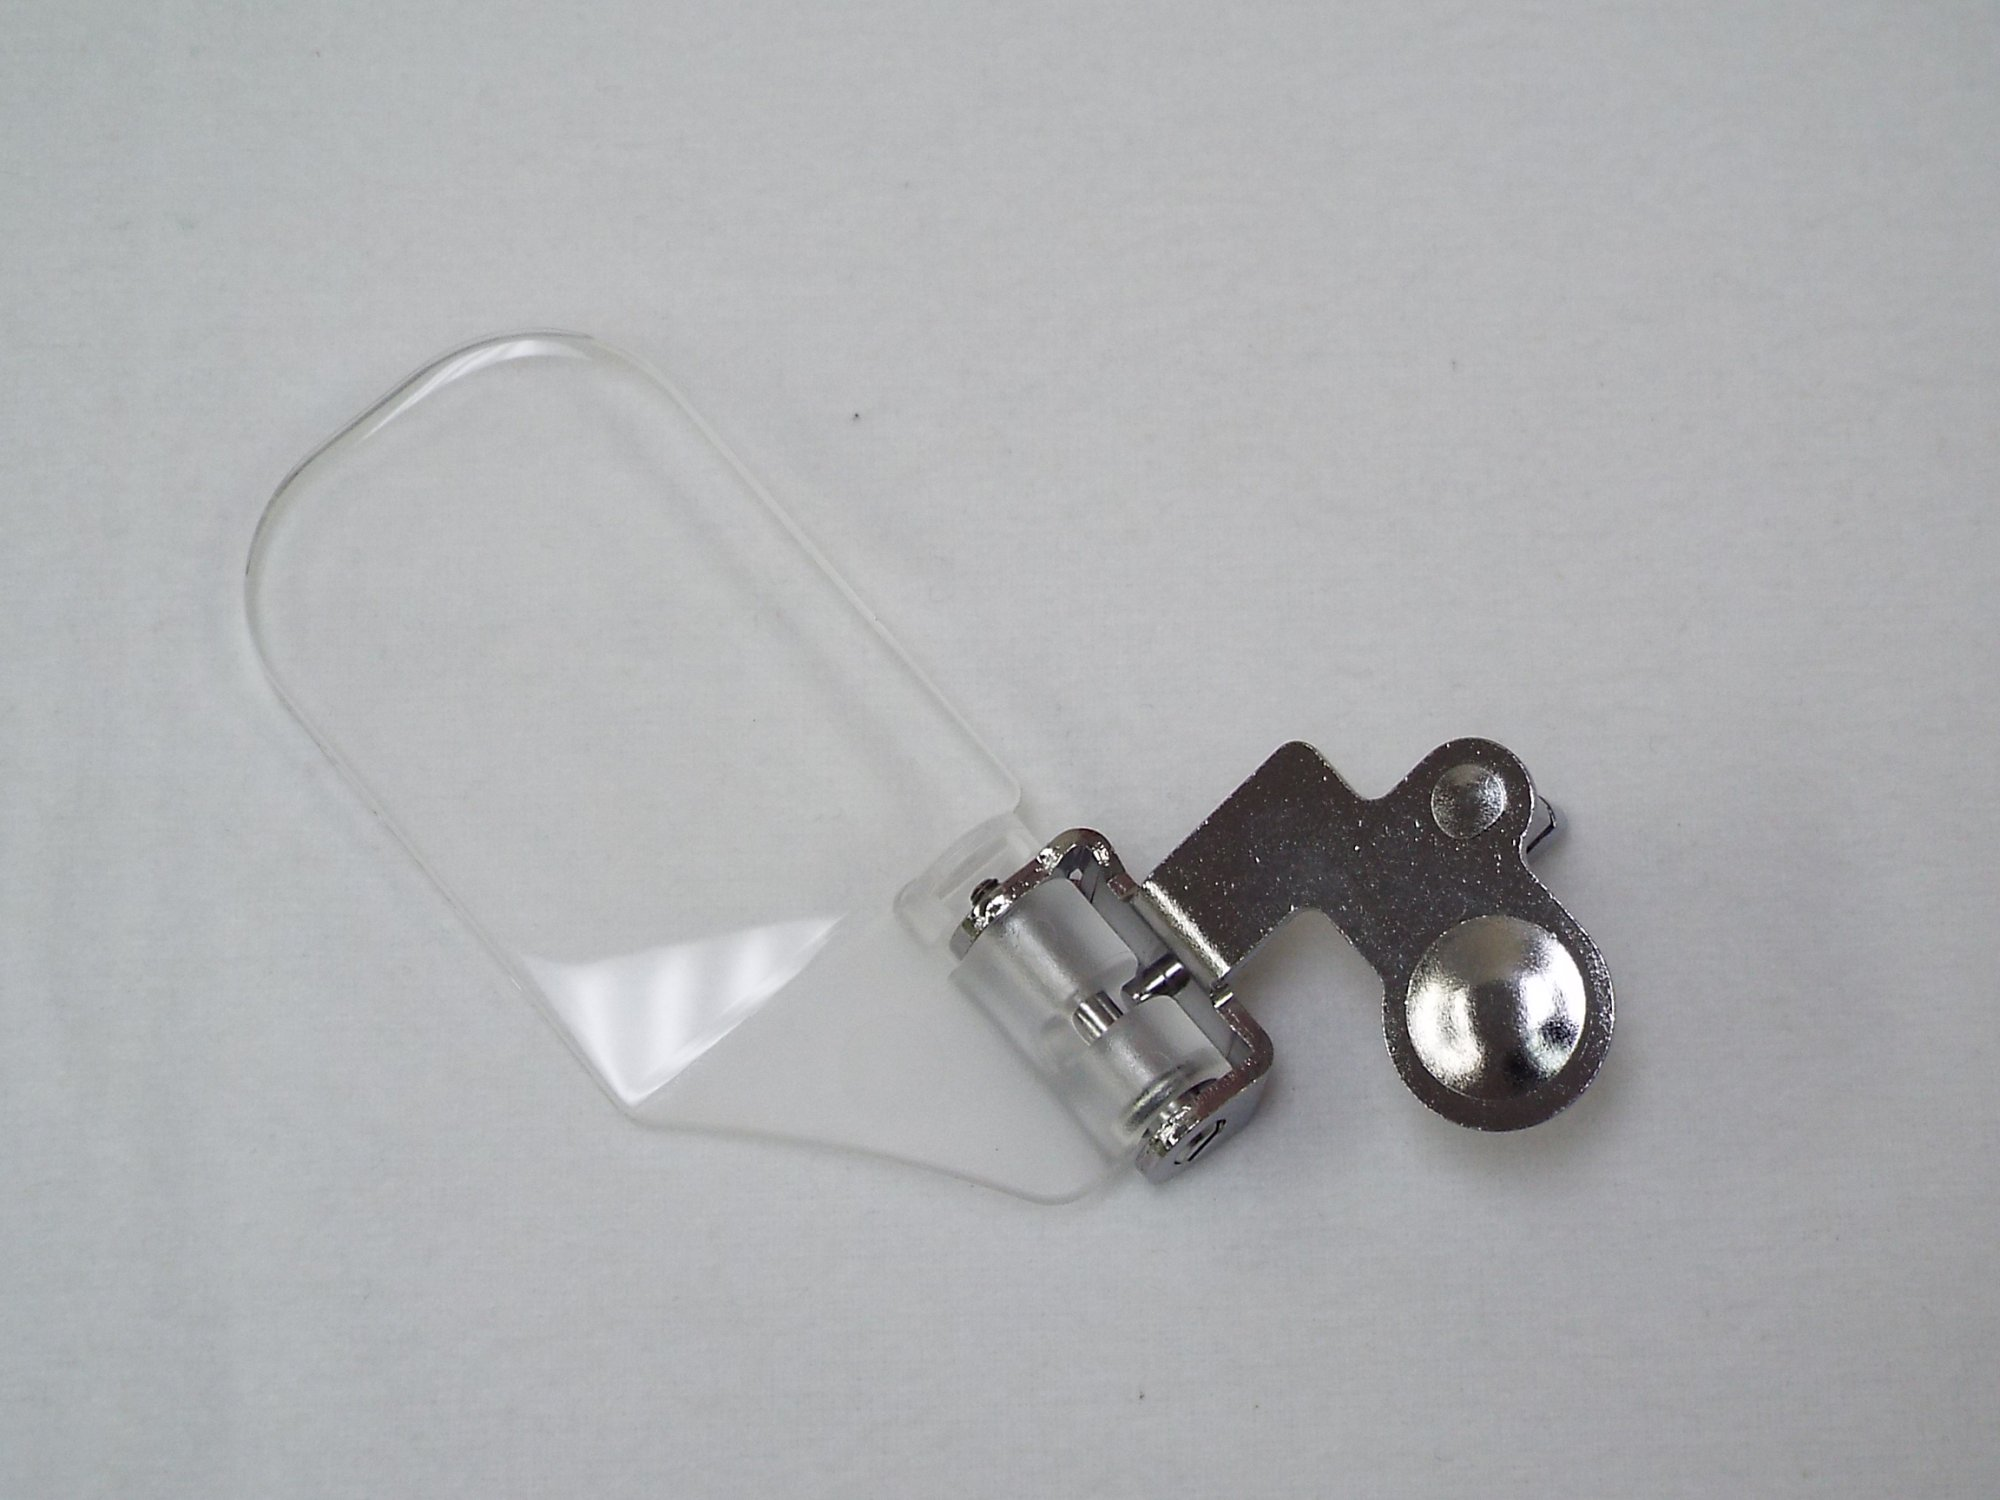 Janome Optic Magnifier